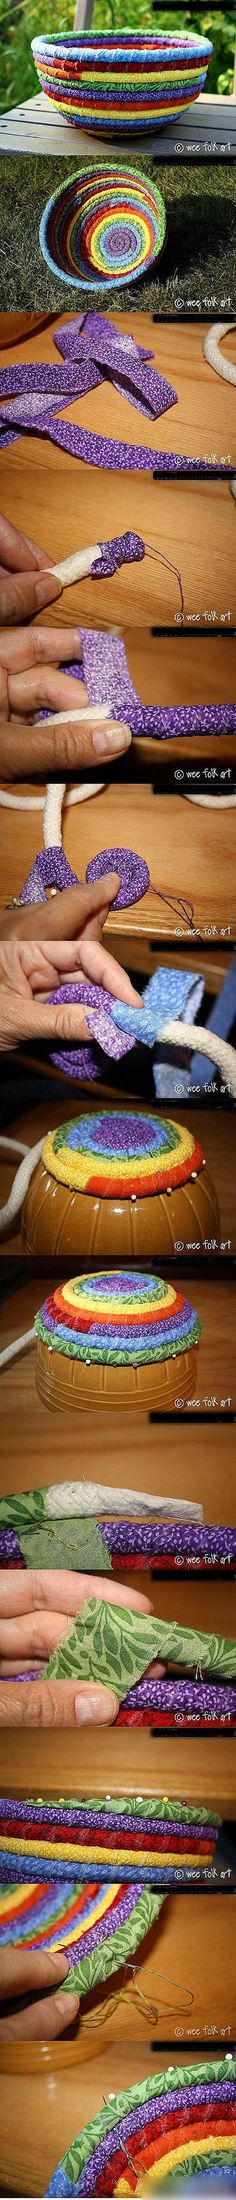 Rope basket rag rugs, fabric bowls, rope, diy crafts, basket, metal furniture, scrap fabric, fabric scraps, textile art